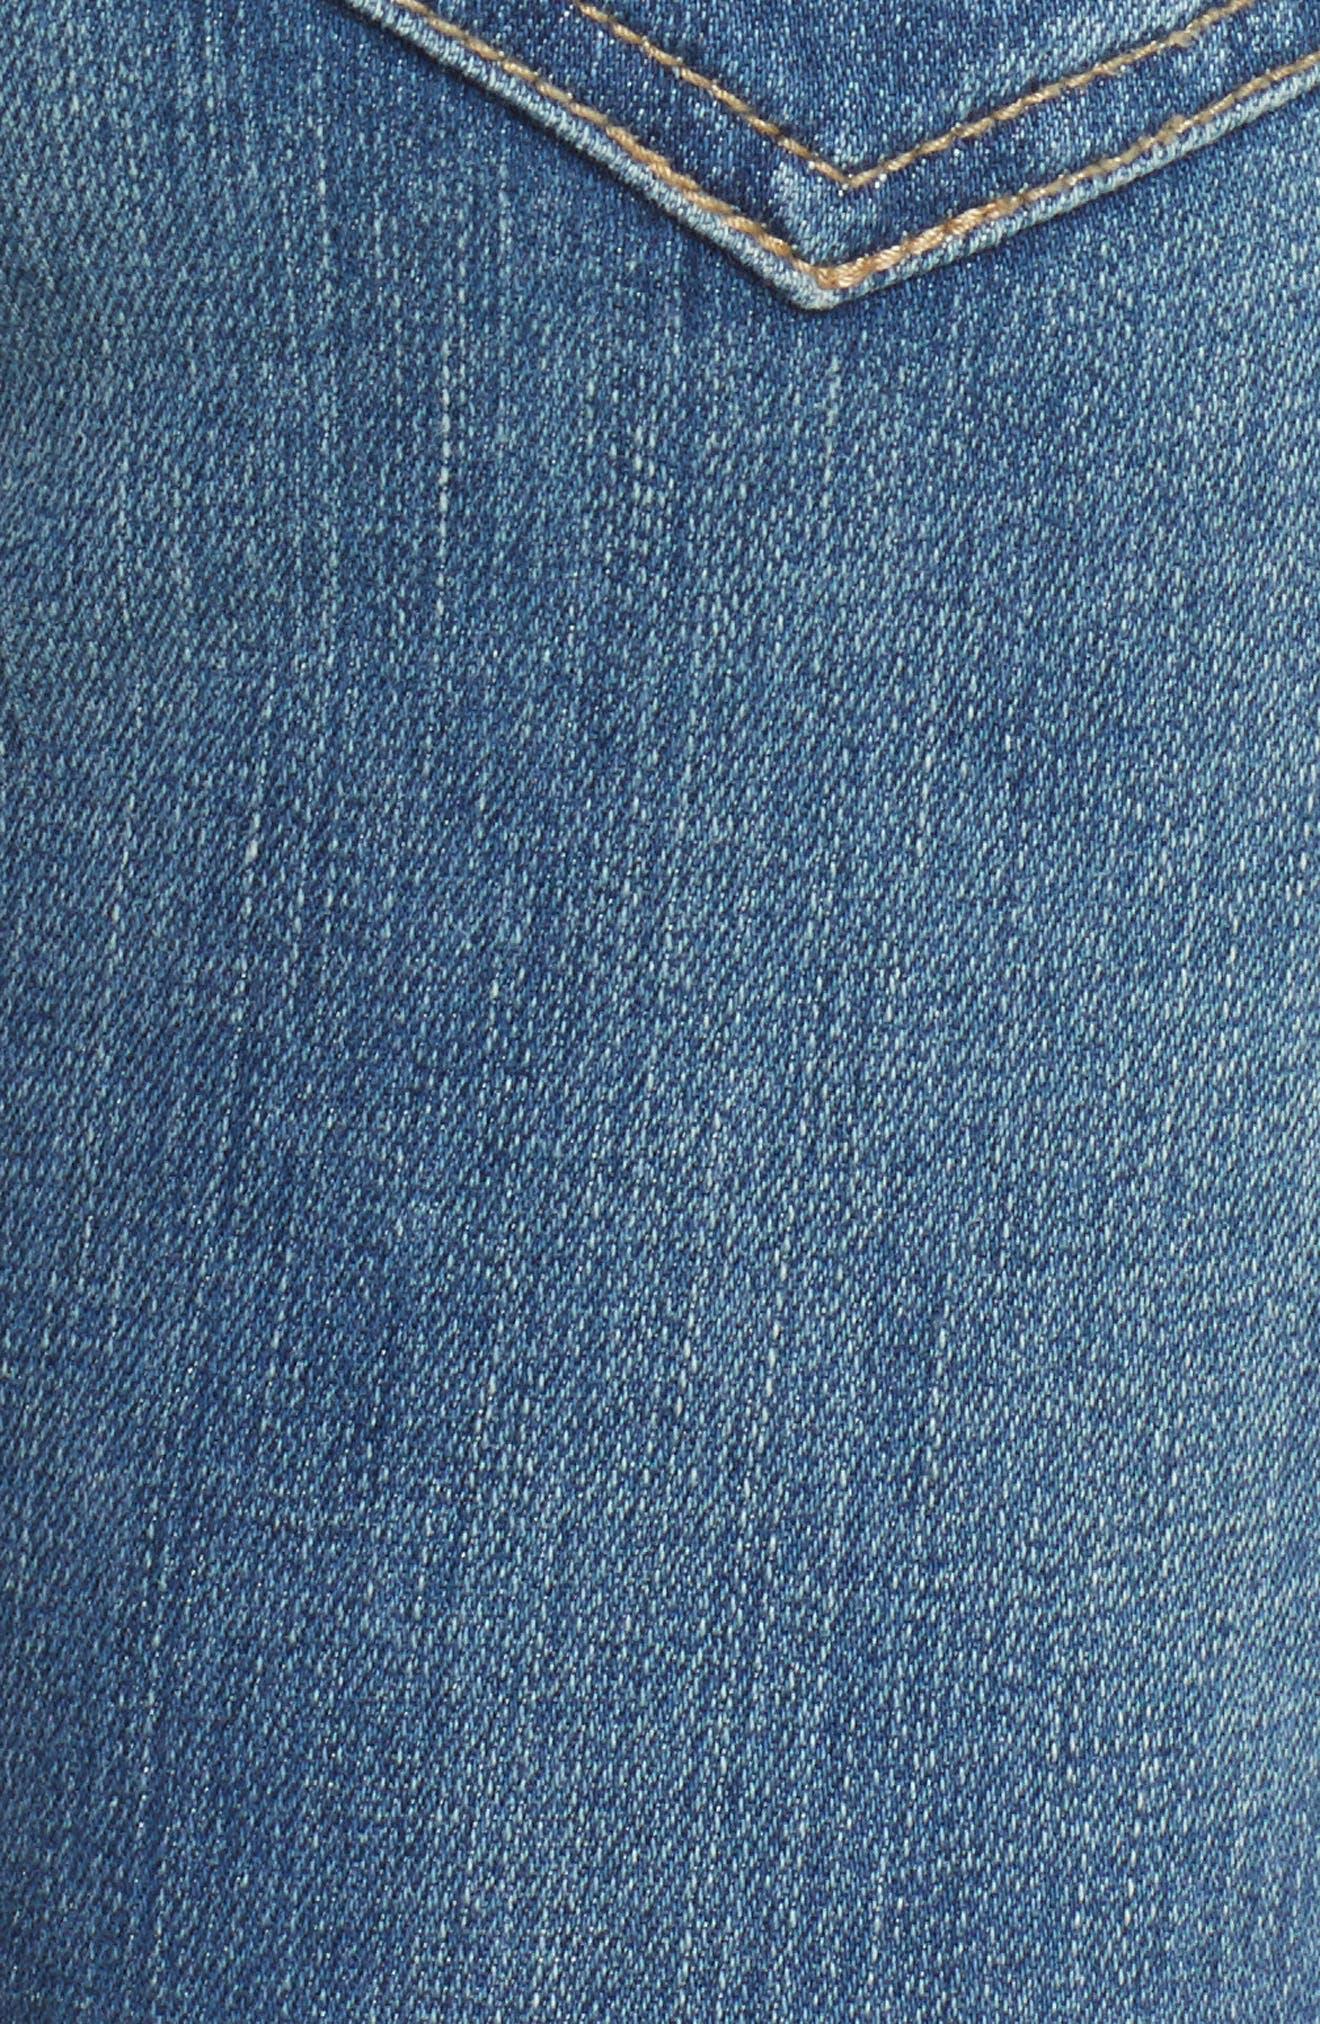 The Stiletto Skinny Jeans,                             Alternate thumbnail 6, color,                             470